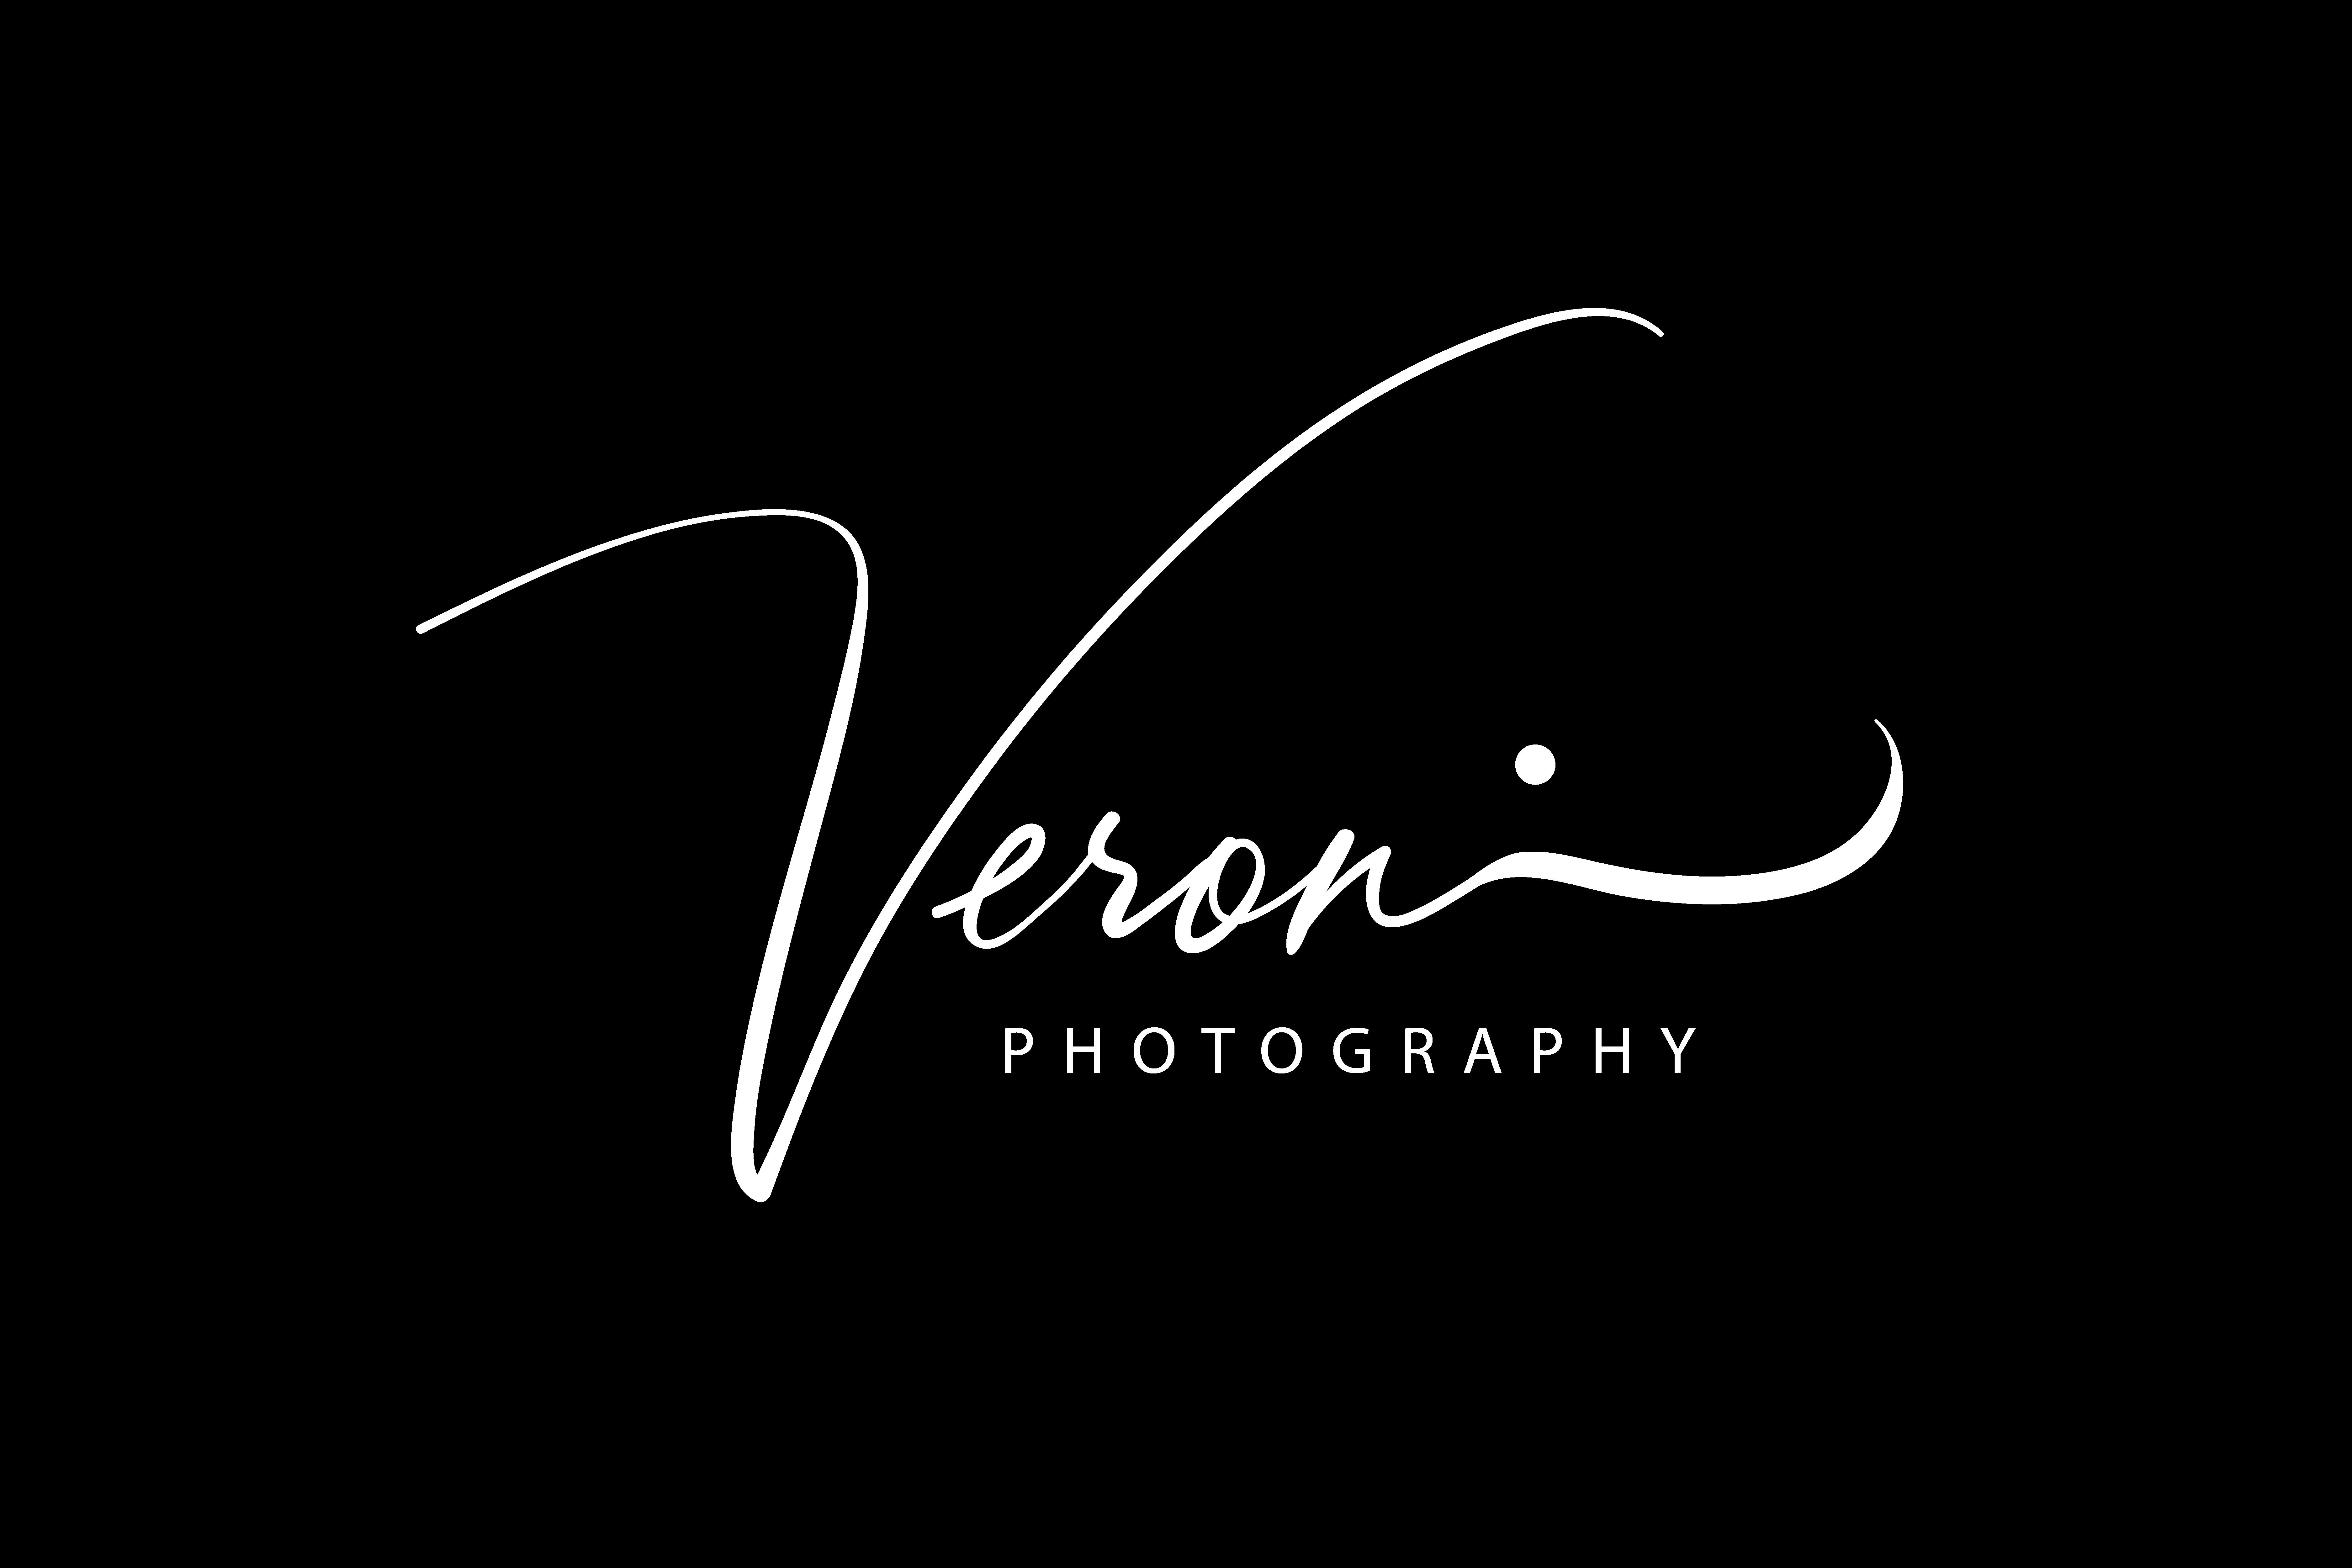 Veroni Photography